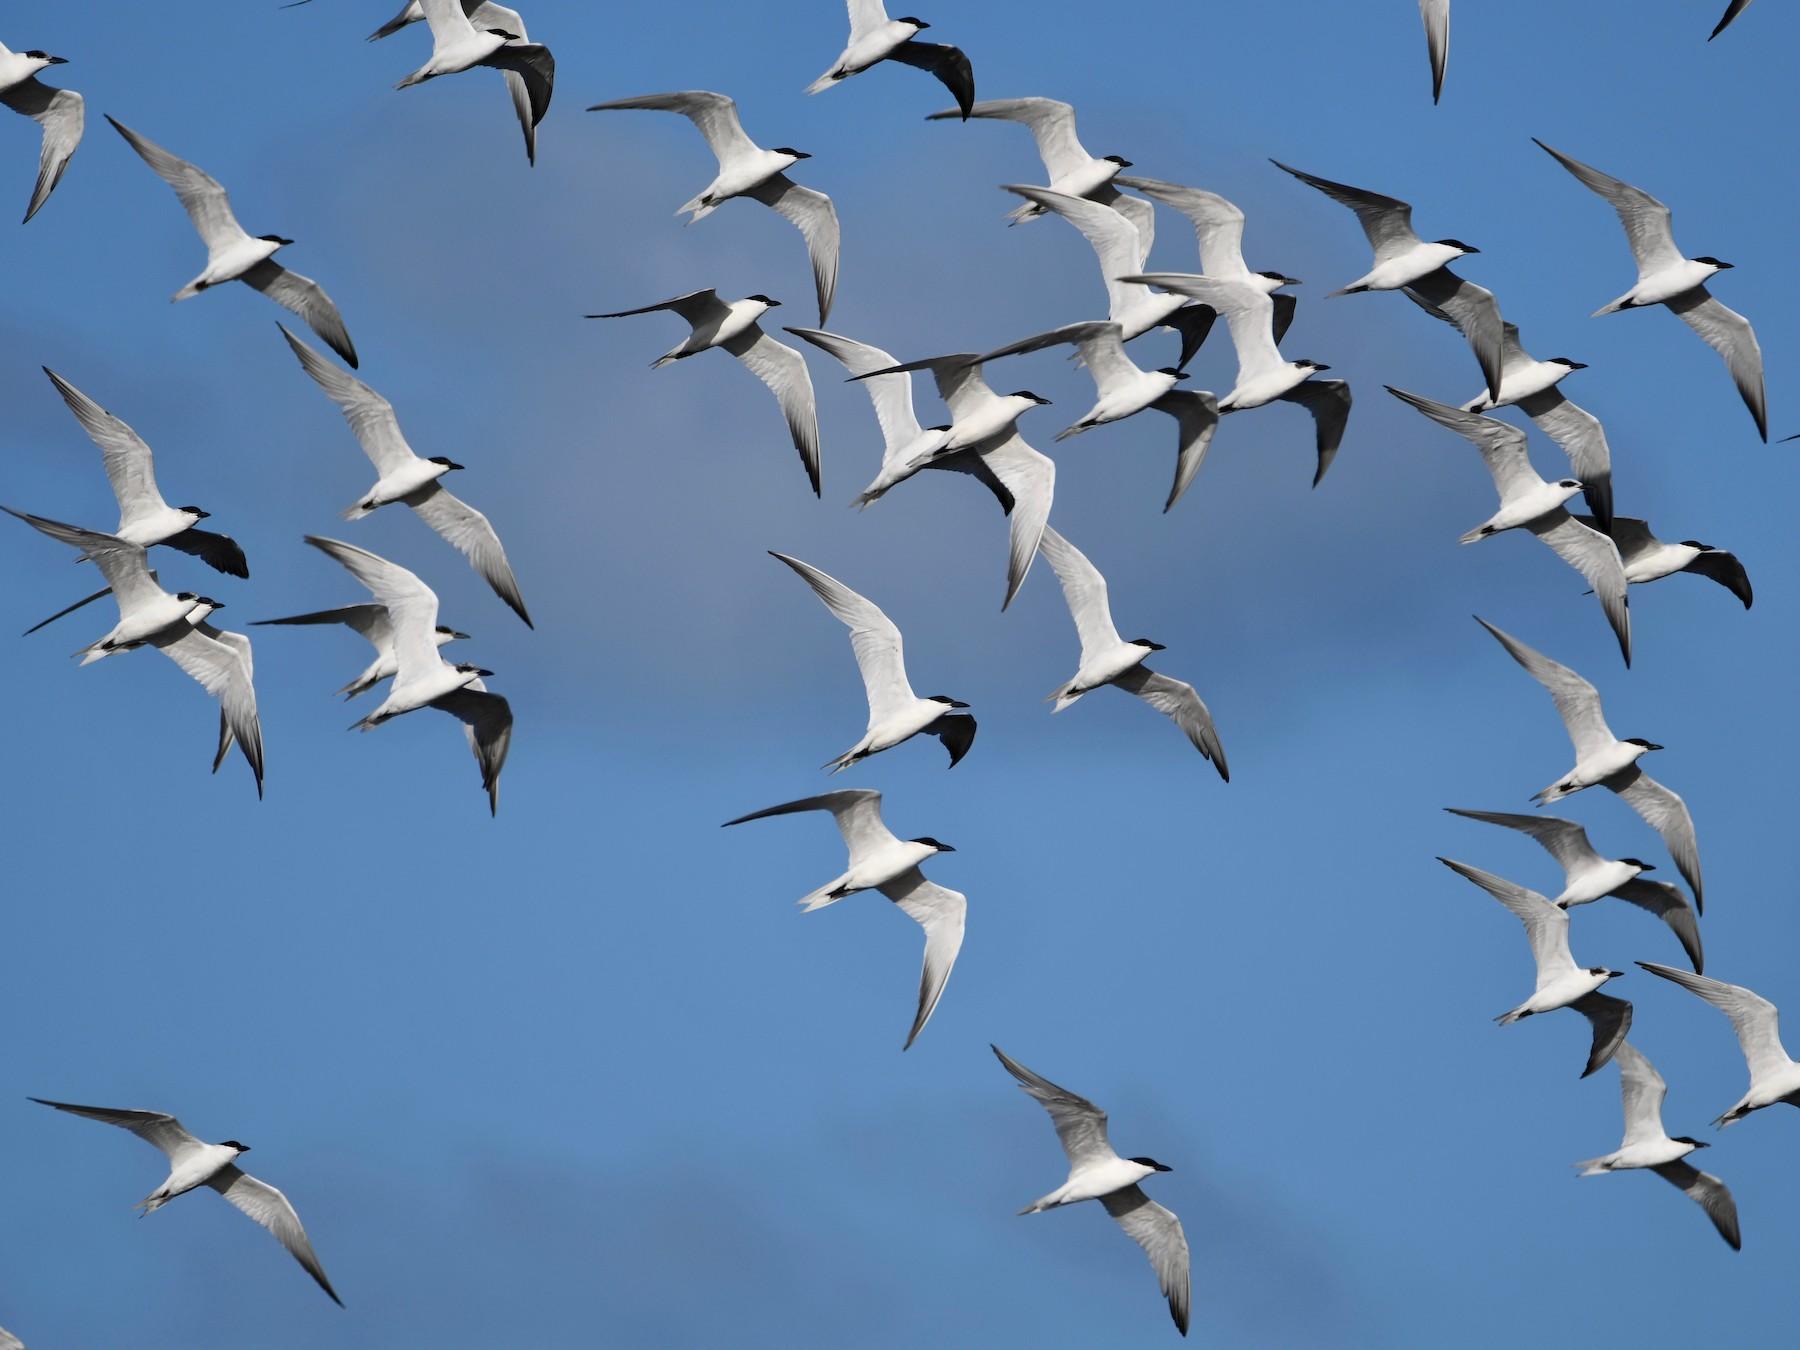 Gull-billed Tern - Michael Daley